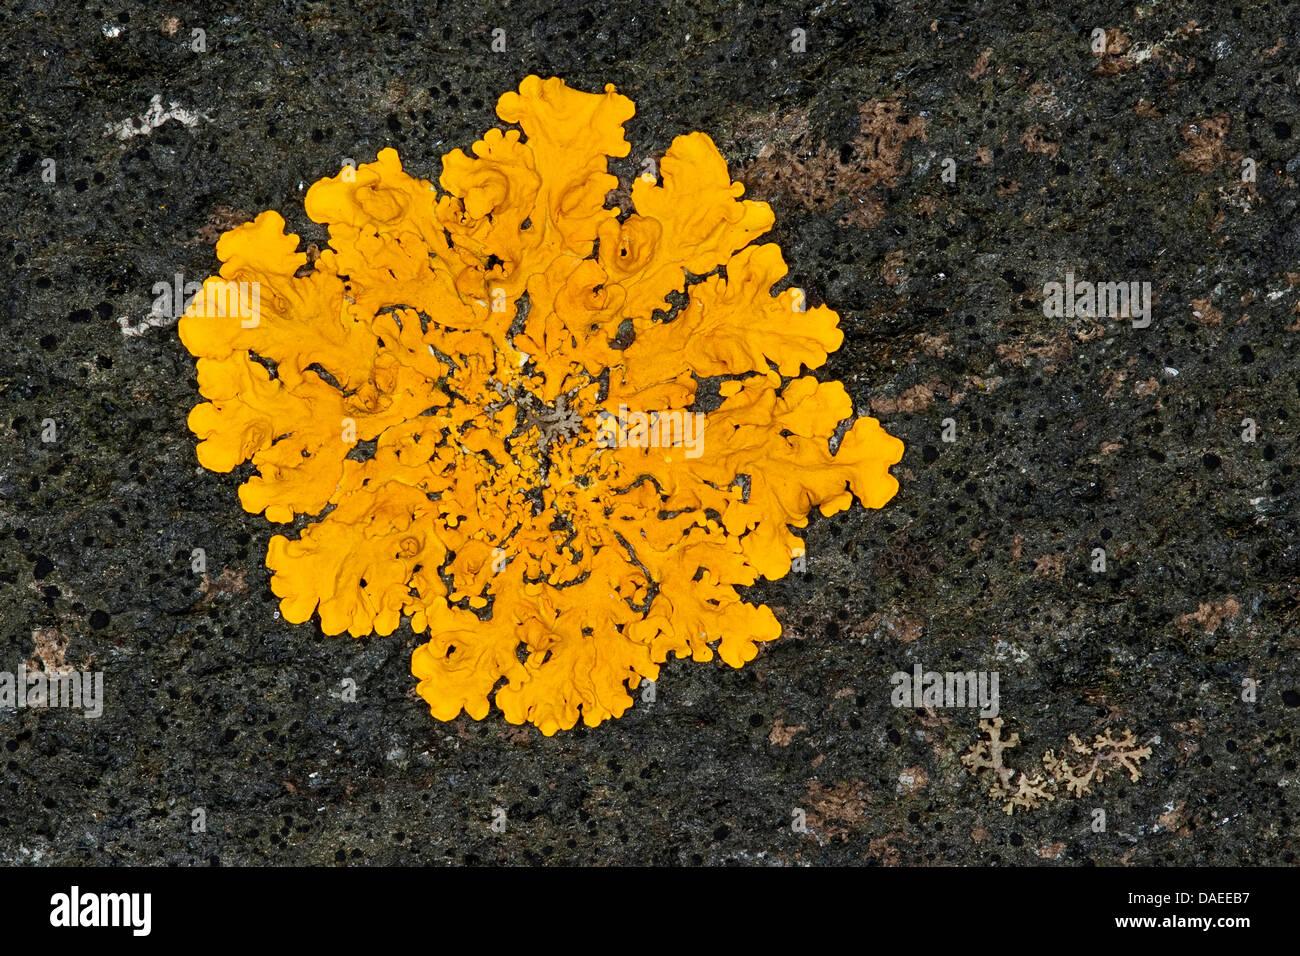 Gelbflechte (Xanthoria vgl. Aureola, Parmelia vgl. Aureola, Physcia vgl. Aureola, Physcia vgl. Ectaneoides, Xanthoria Stockbild